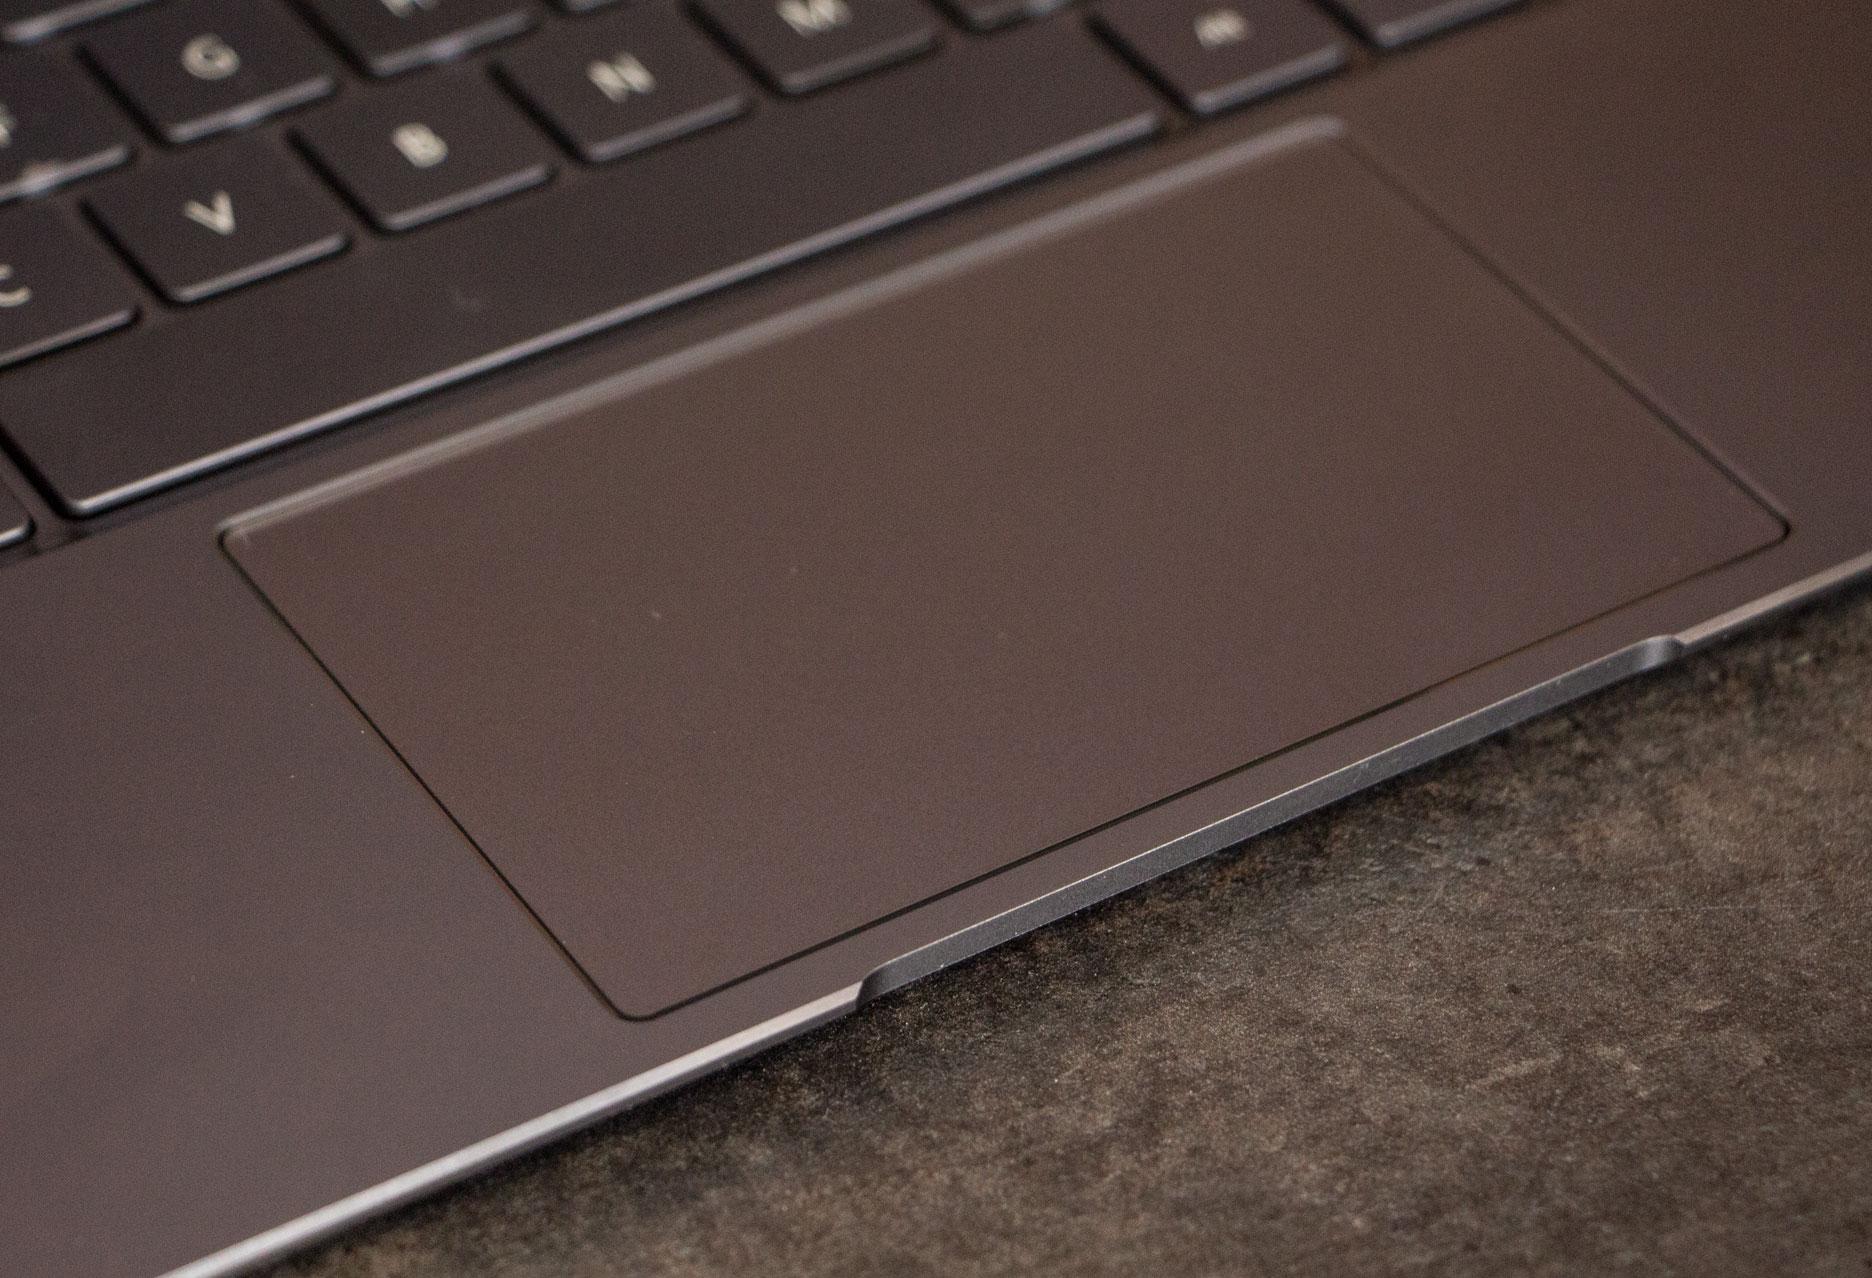 Huawei MateBook X touchpad